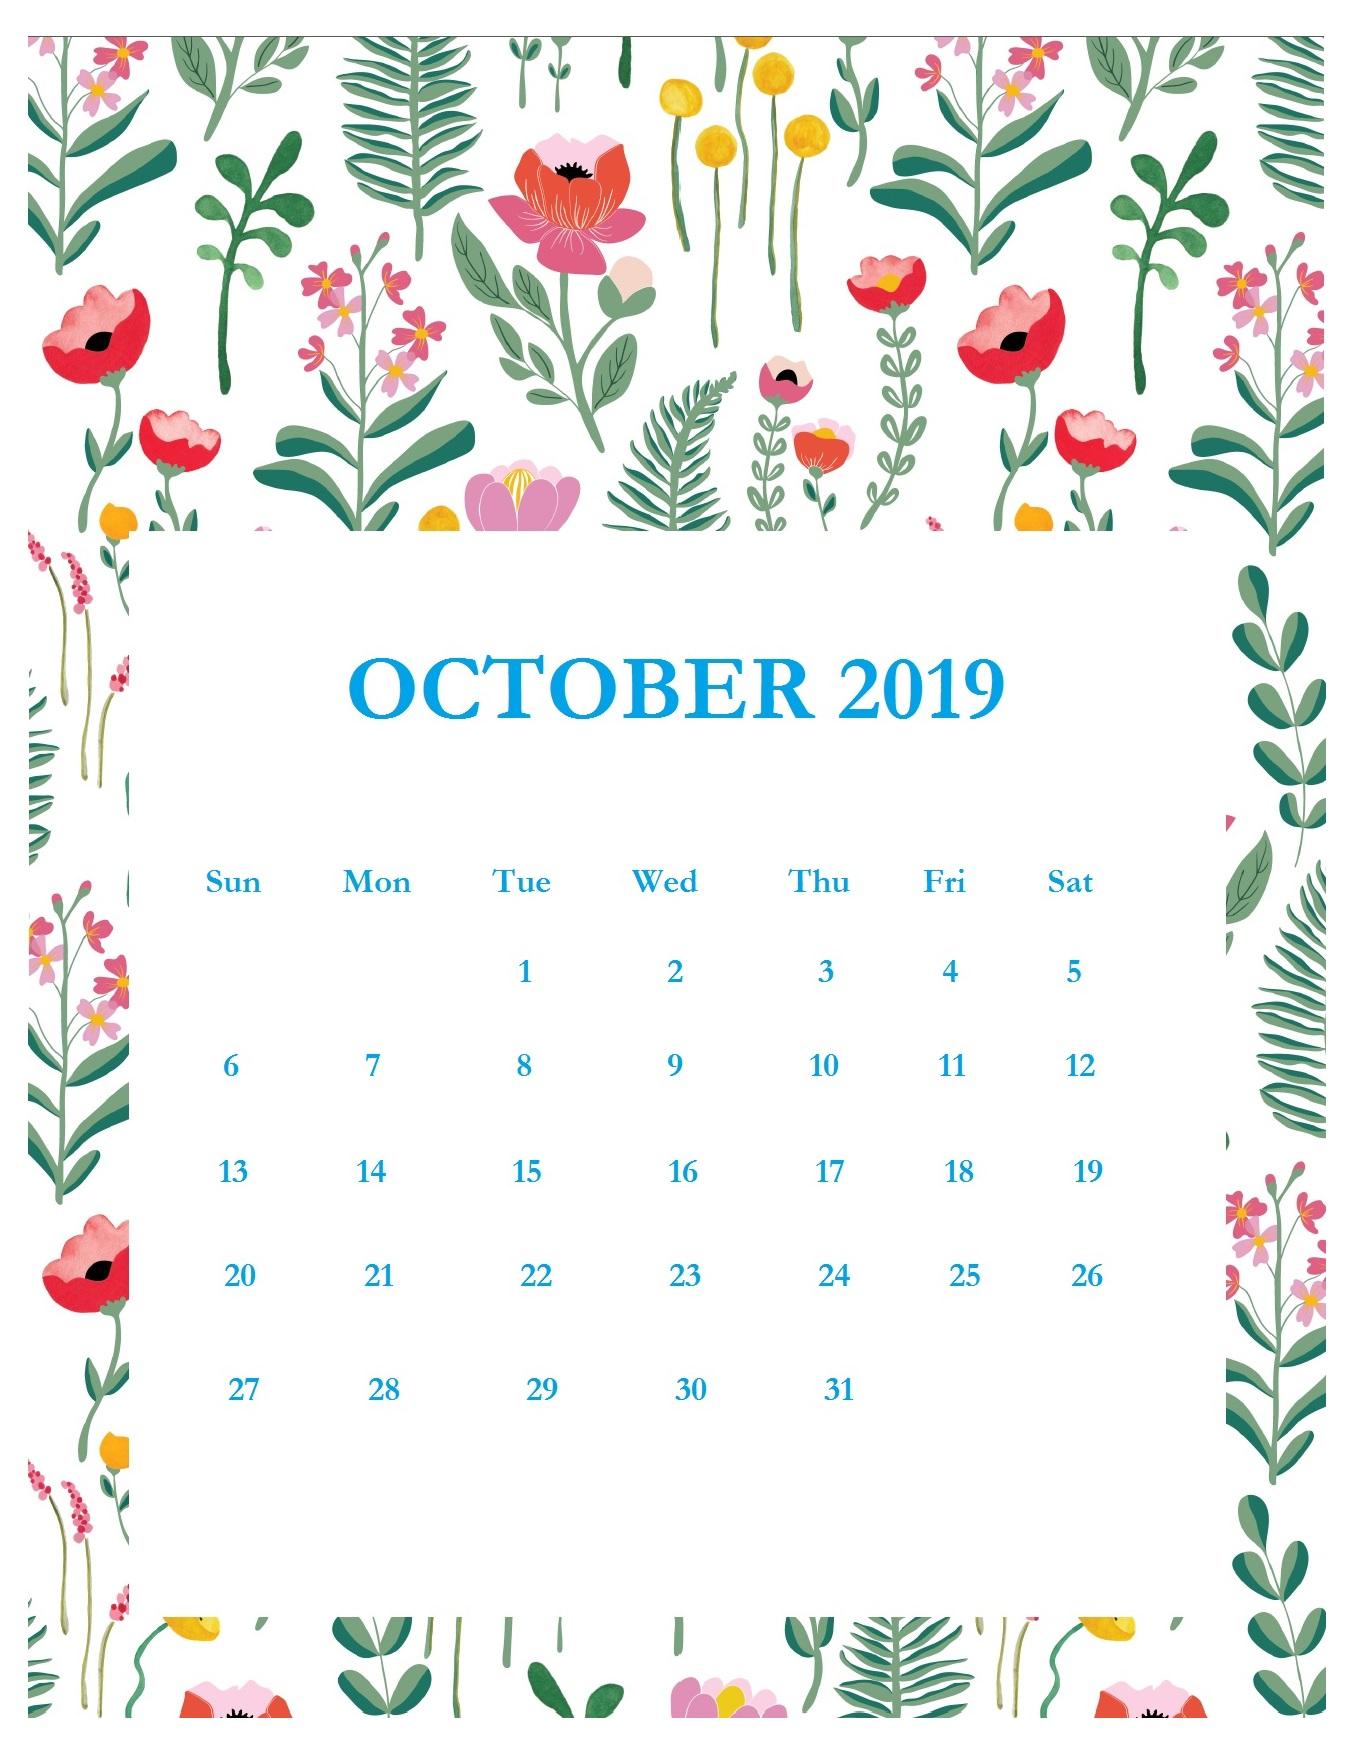 Print Beautiful October 2019 Calendar Template